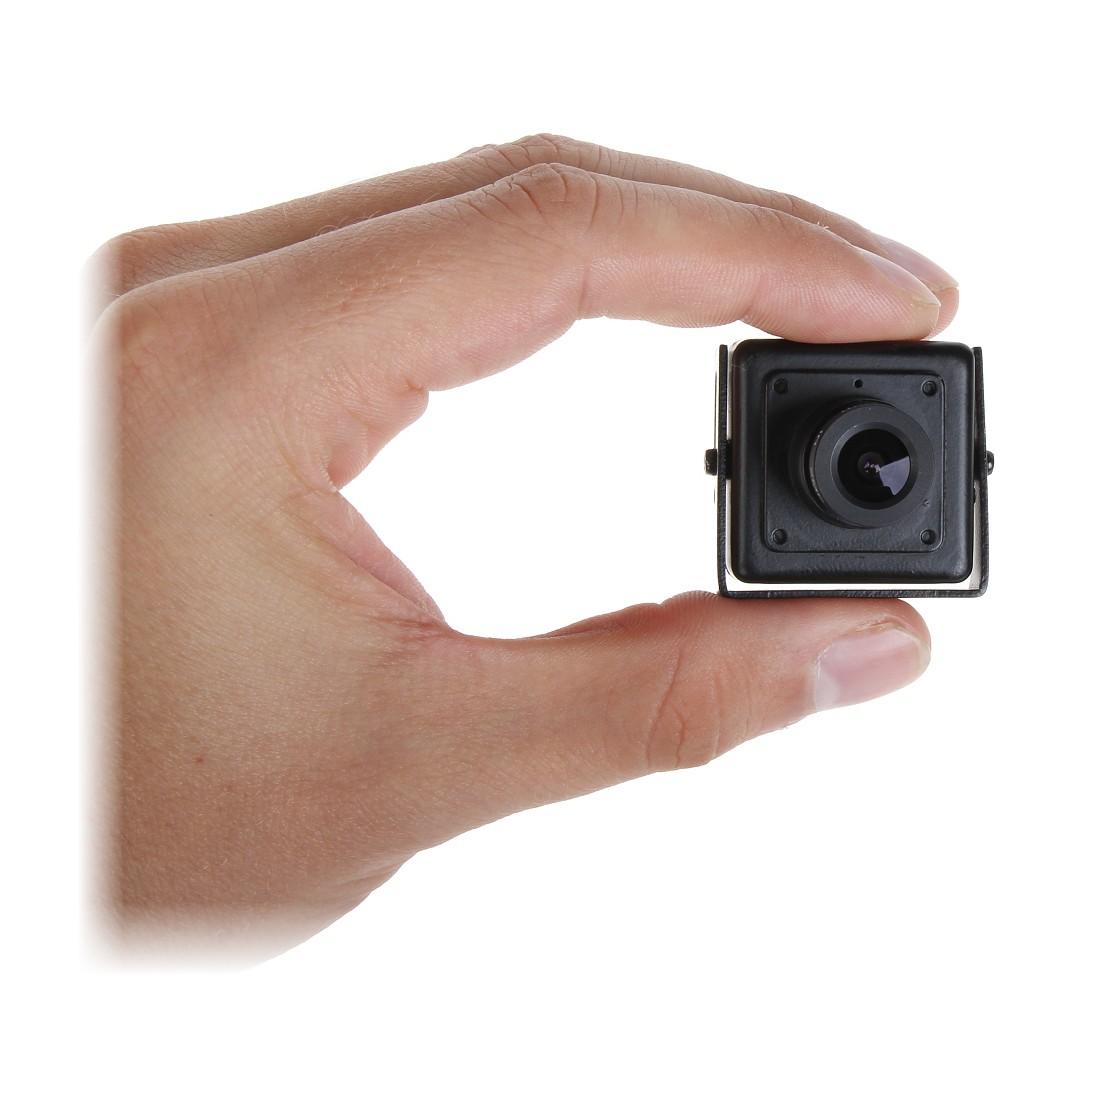 Kamera je skutocne malá